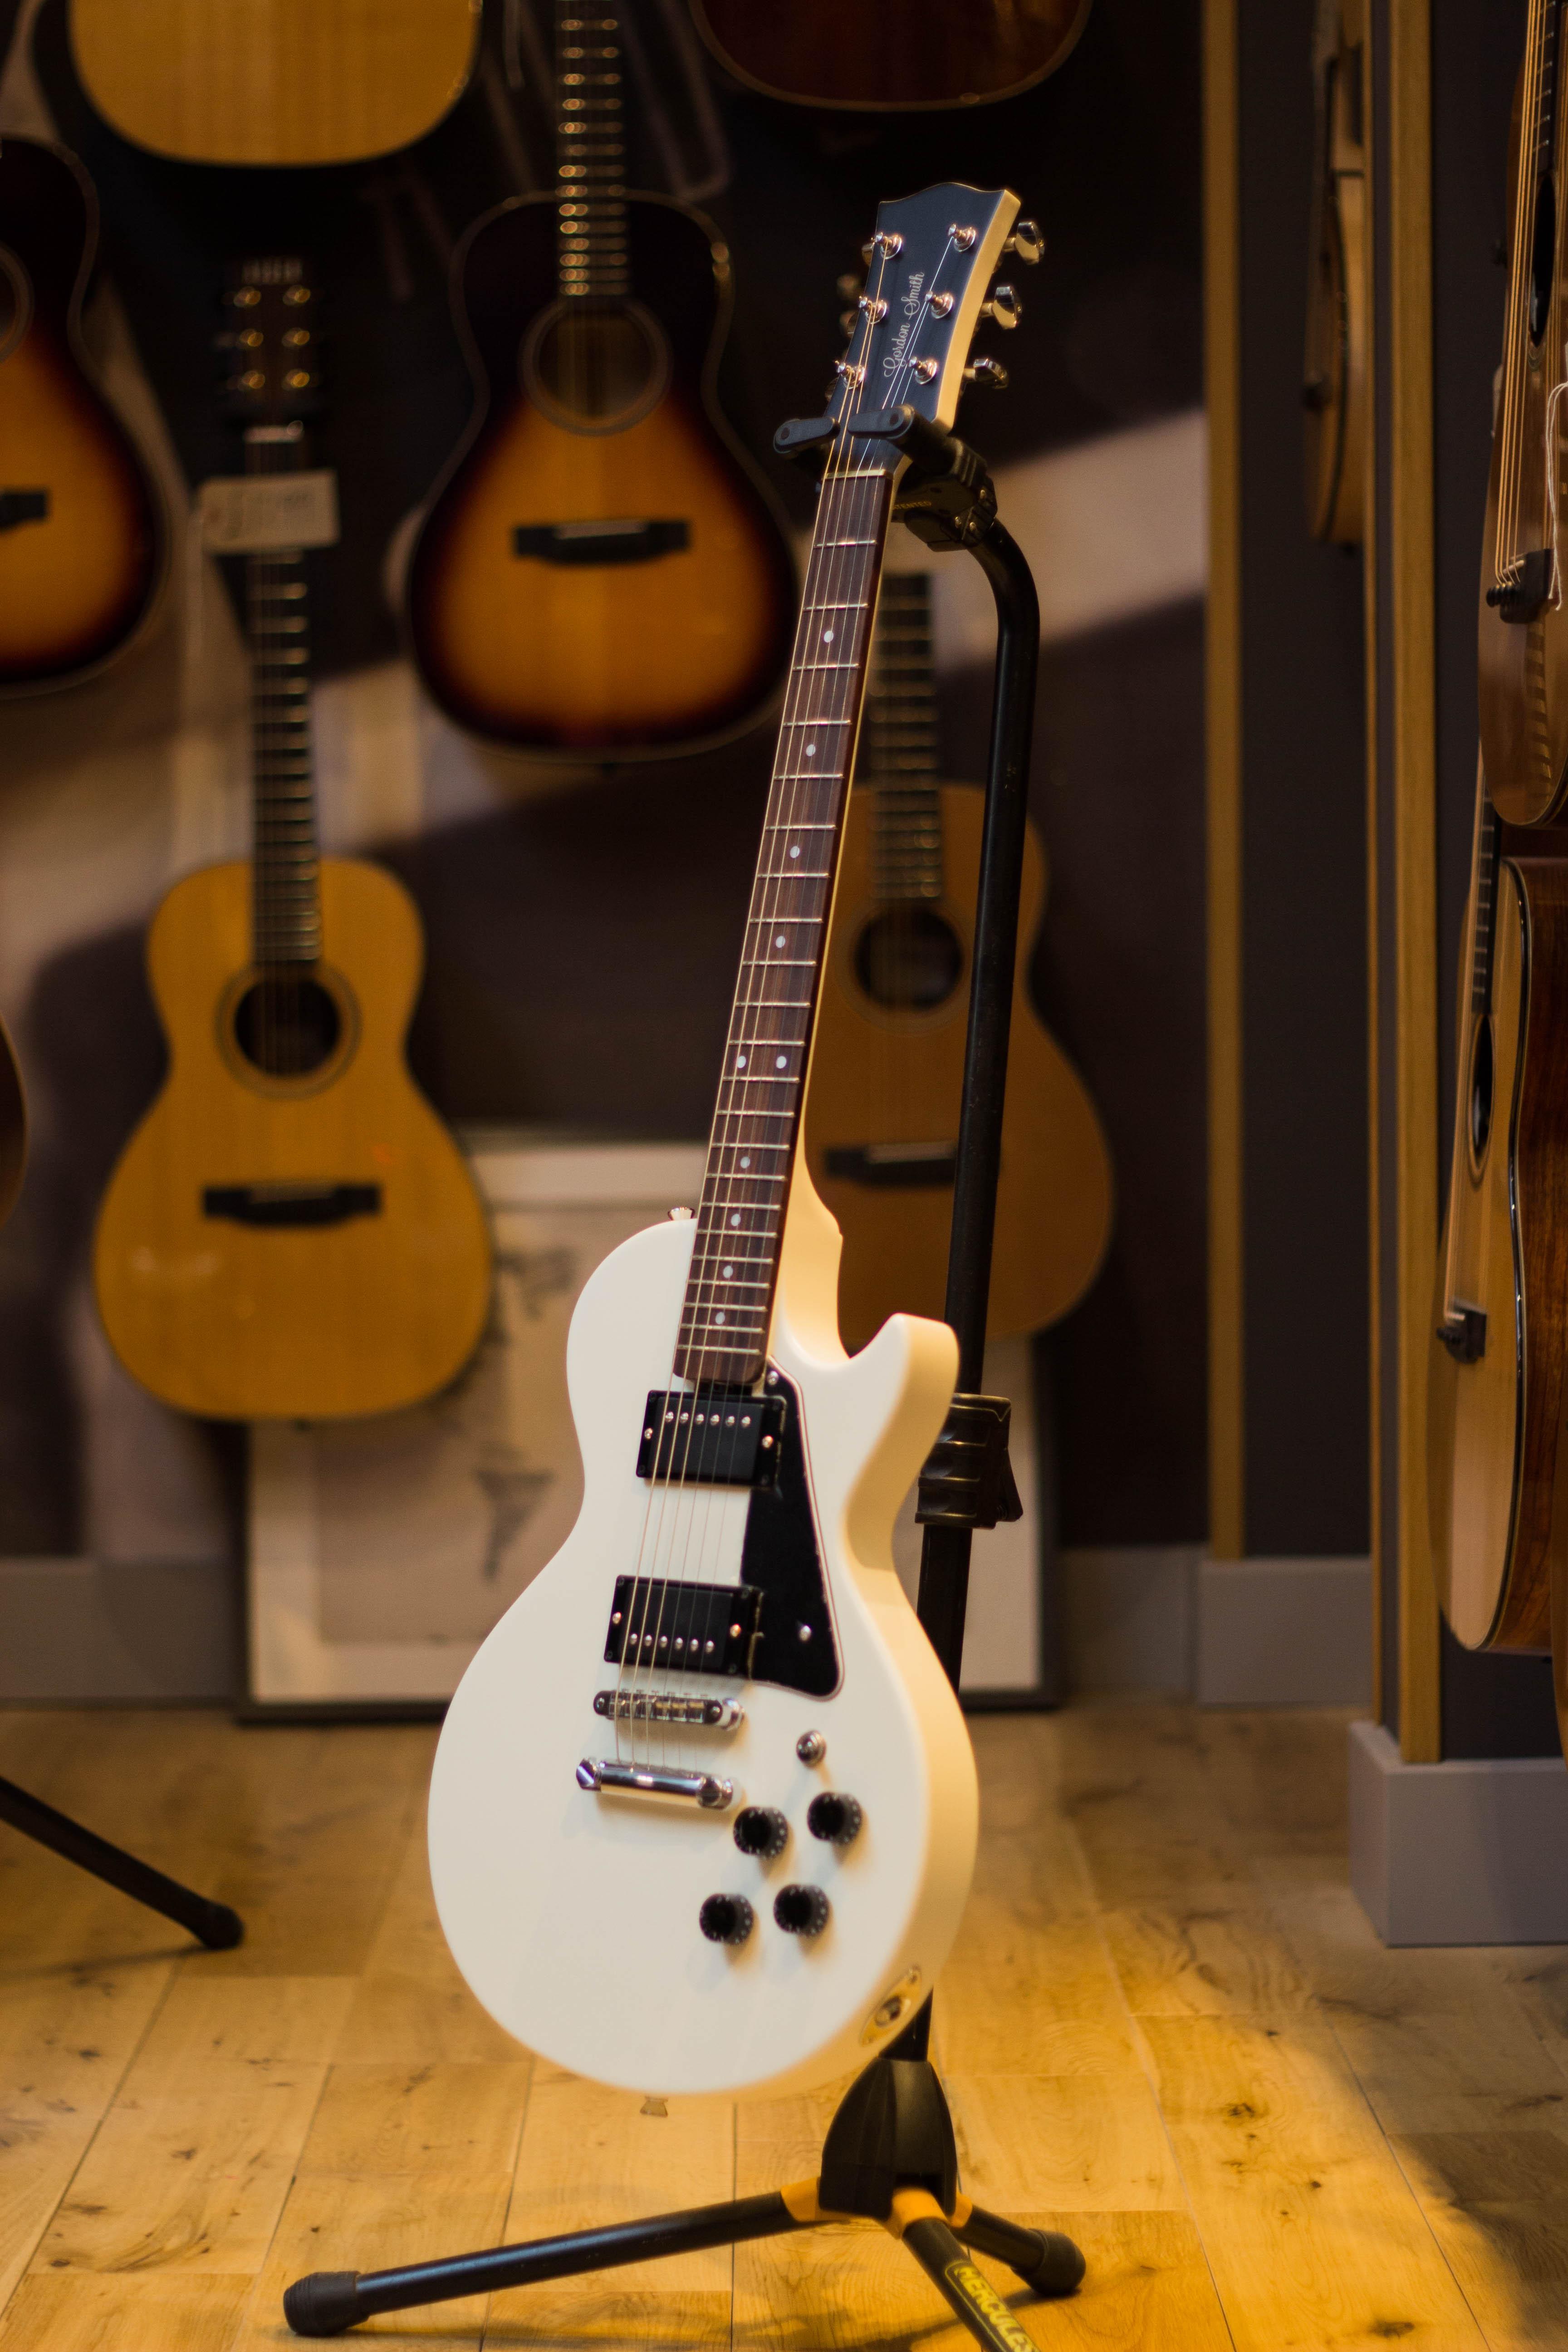 gordon smith guitars dating services